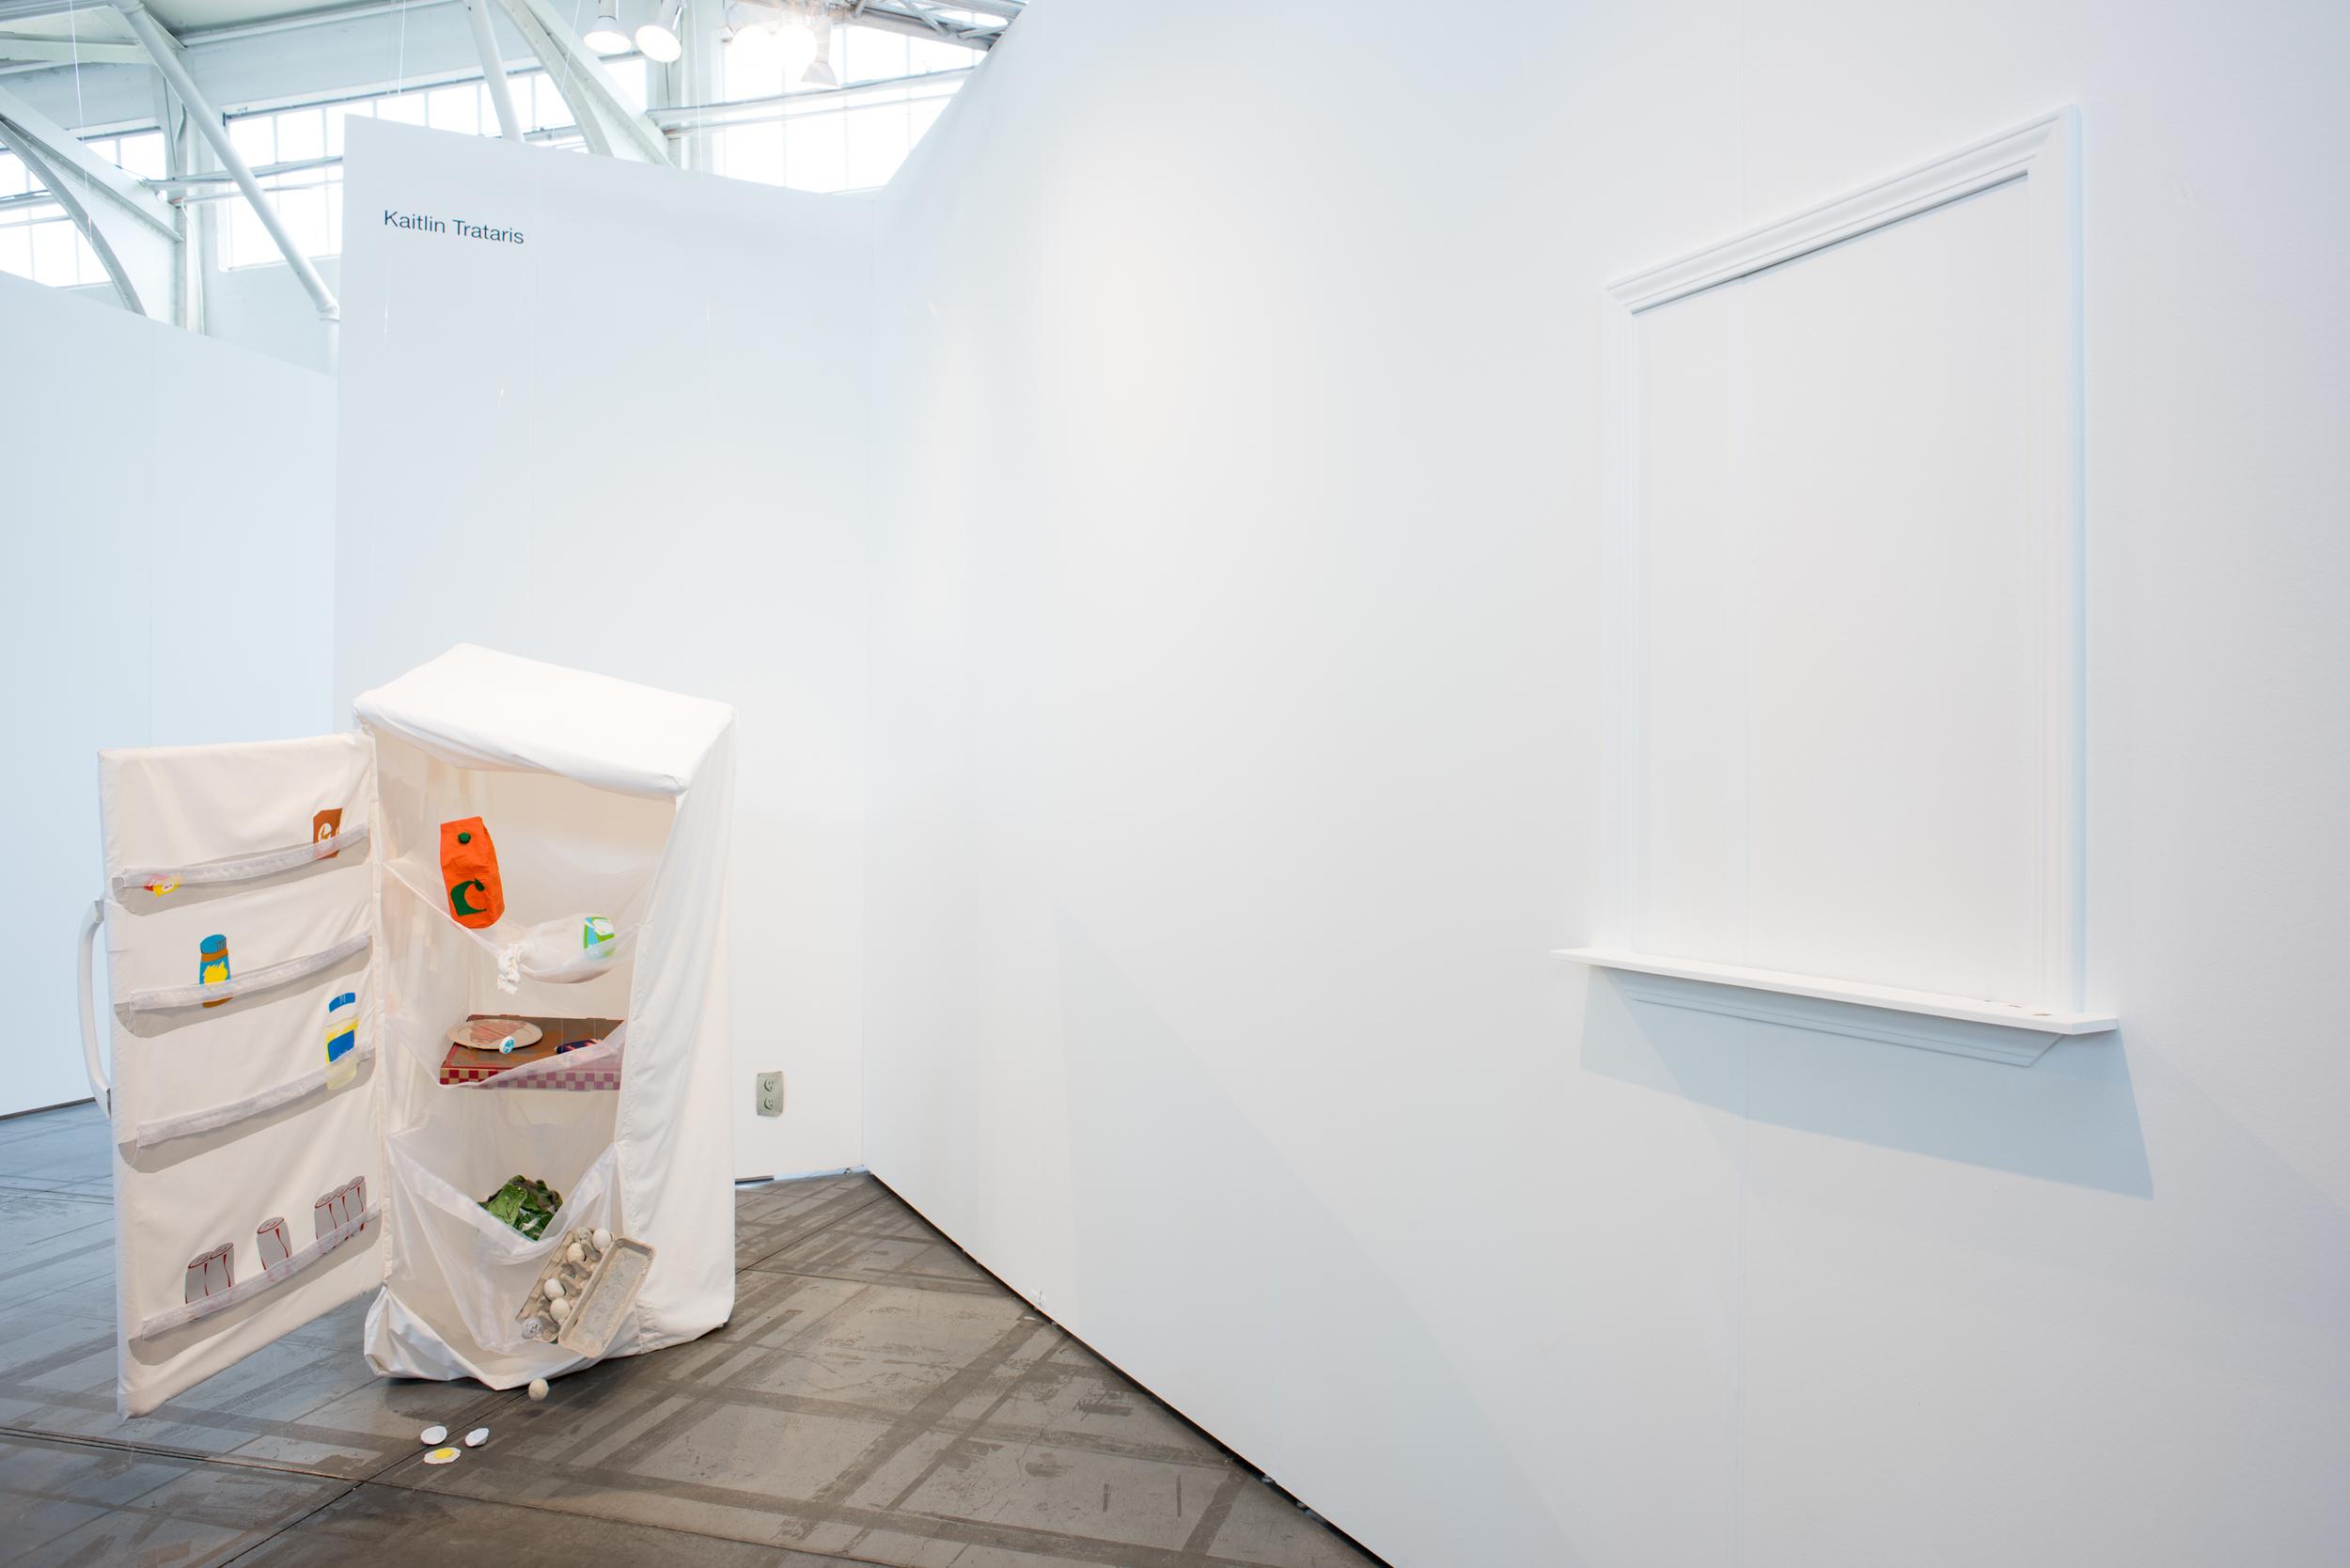 """Look At the Mess We've Made"" (Exhibition view at Fort Mason, San Francisco, CA), 2016"